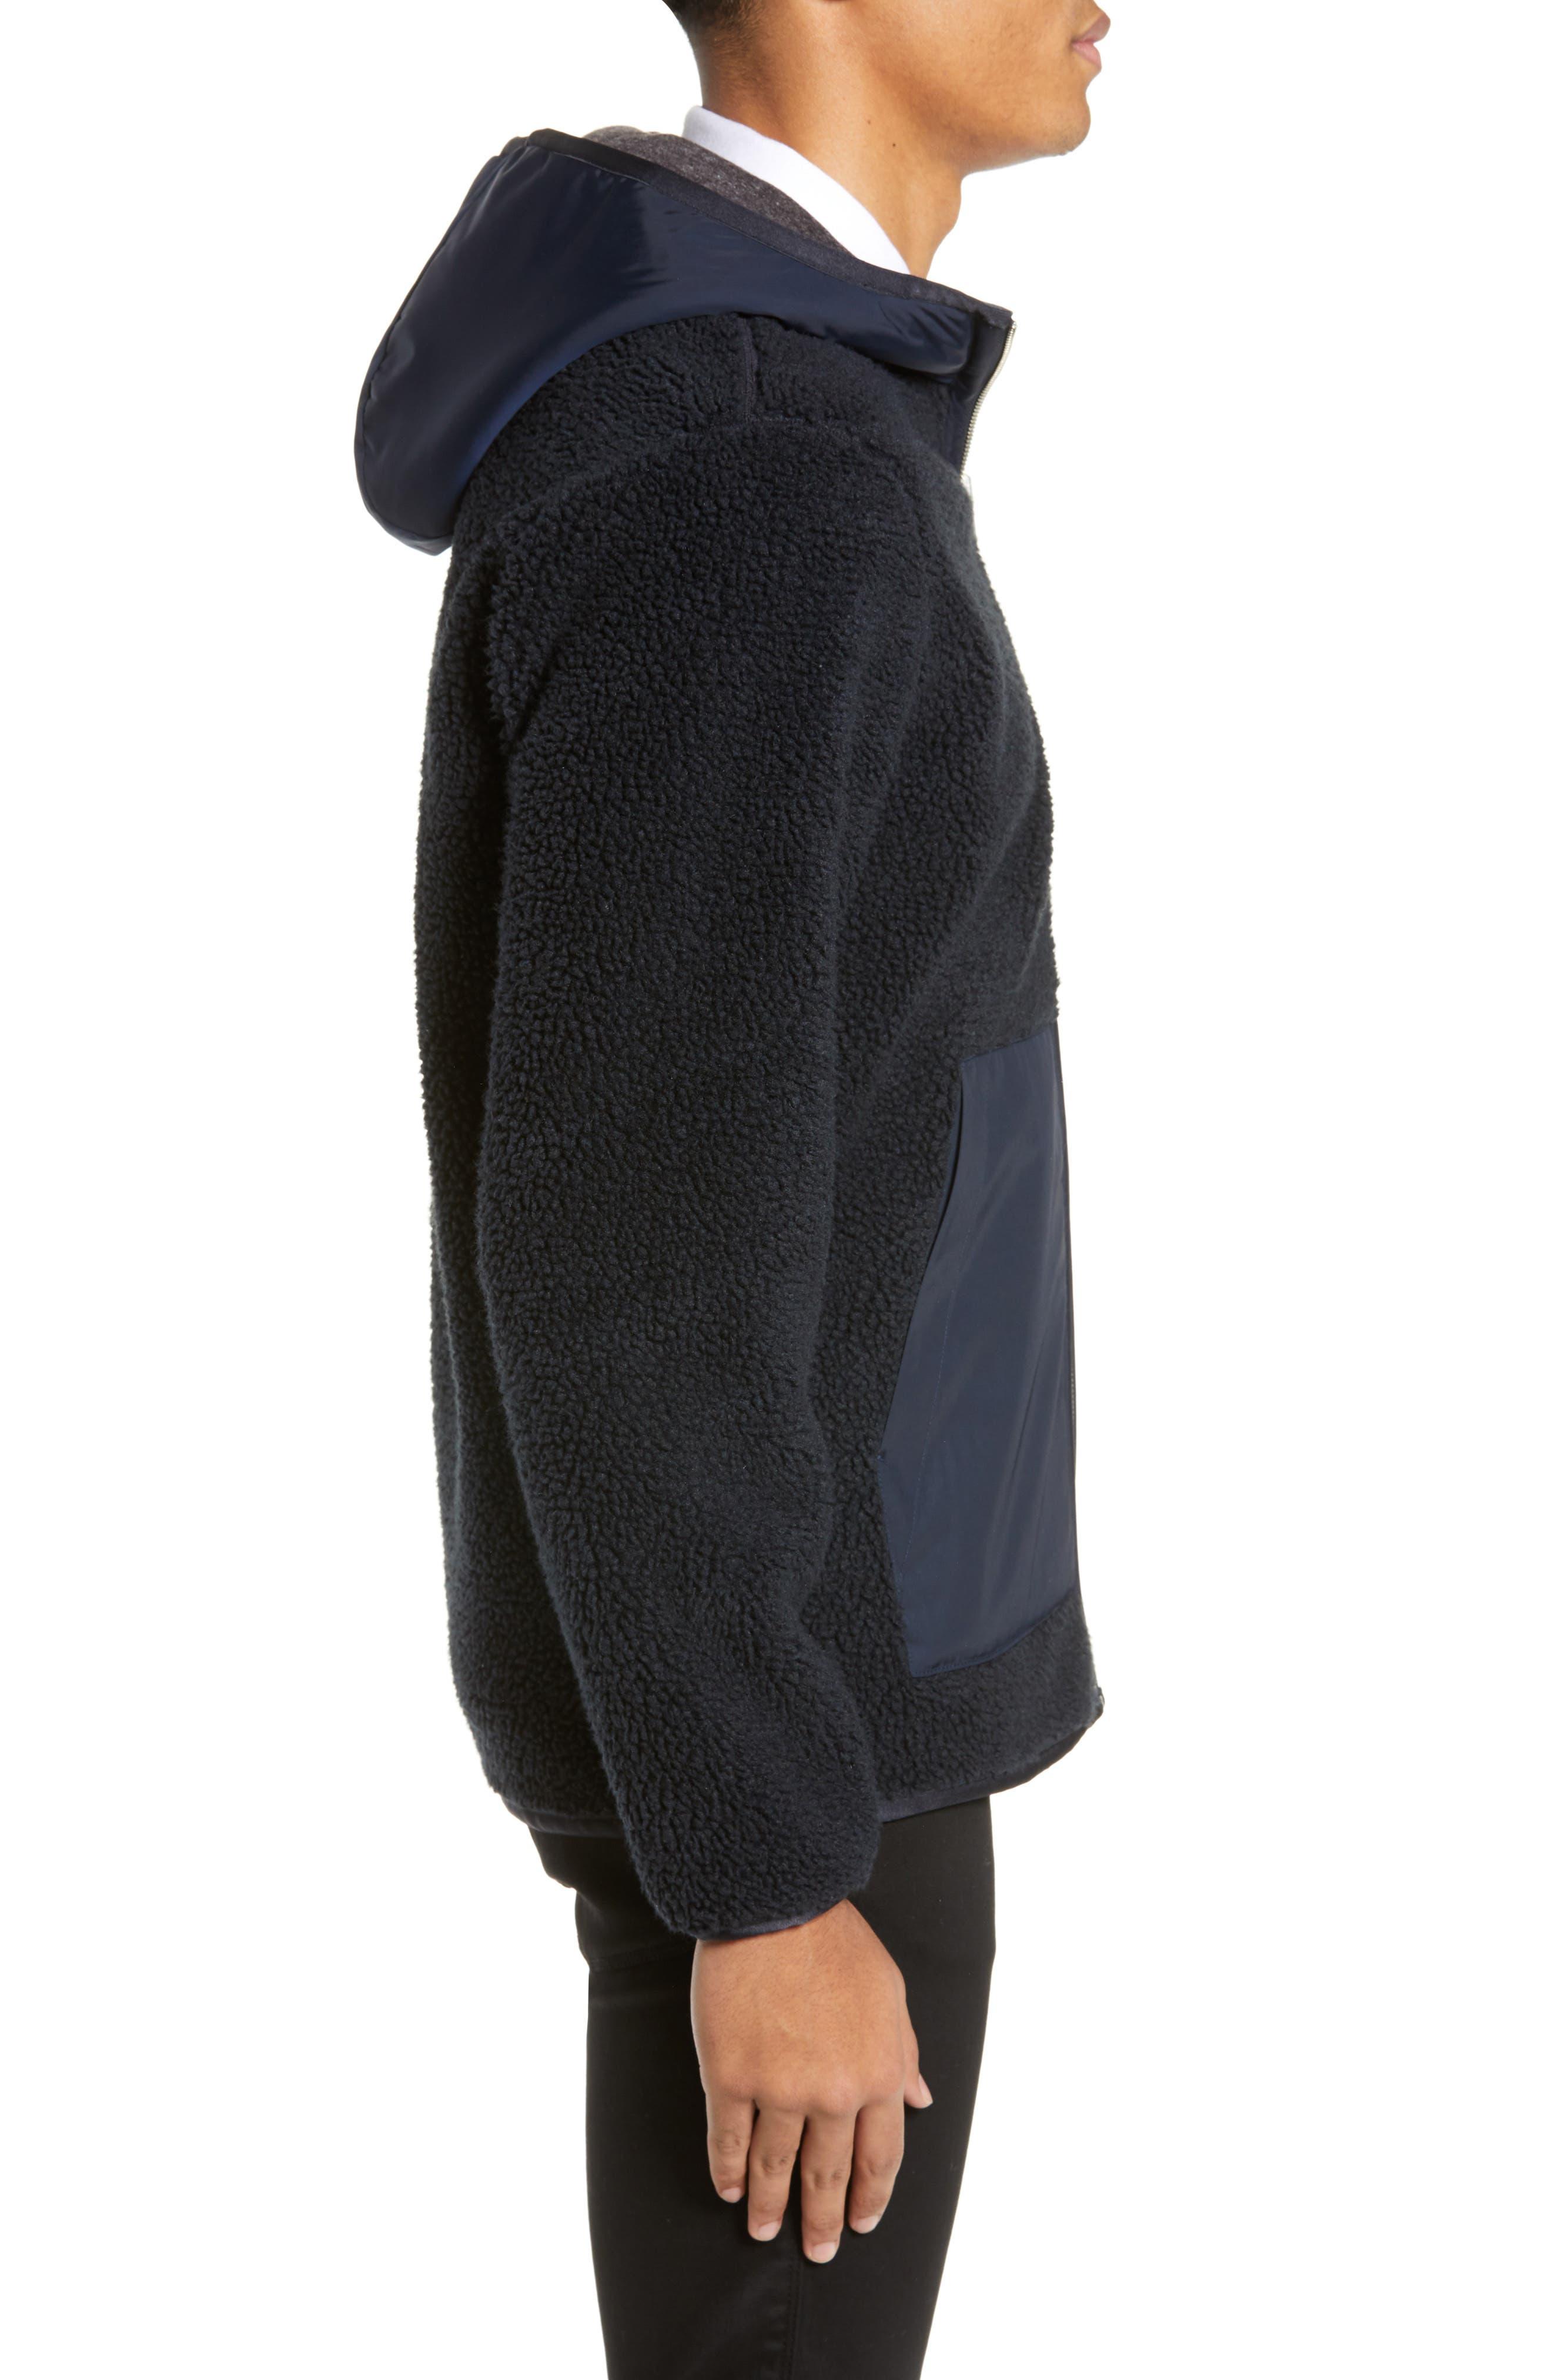 THEORY,                             Polar Fleece Reversible Zip Hoodie,                             Alternate thumbnail 4, color,                             ECLIPSE/ ASHPALT MELANGE